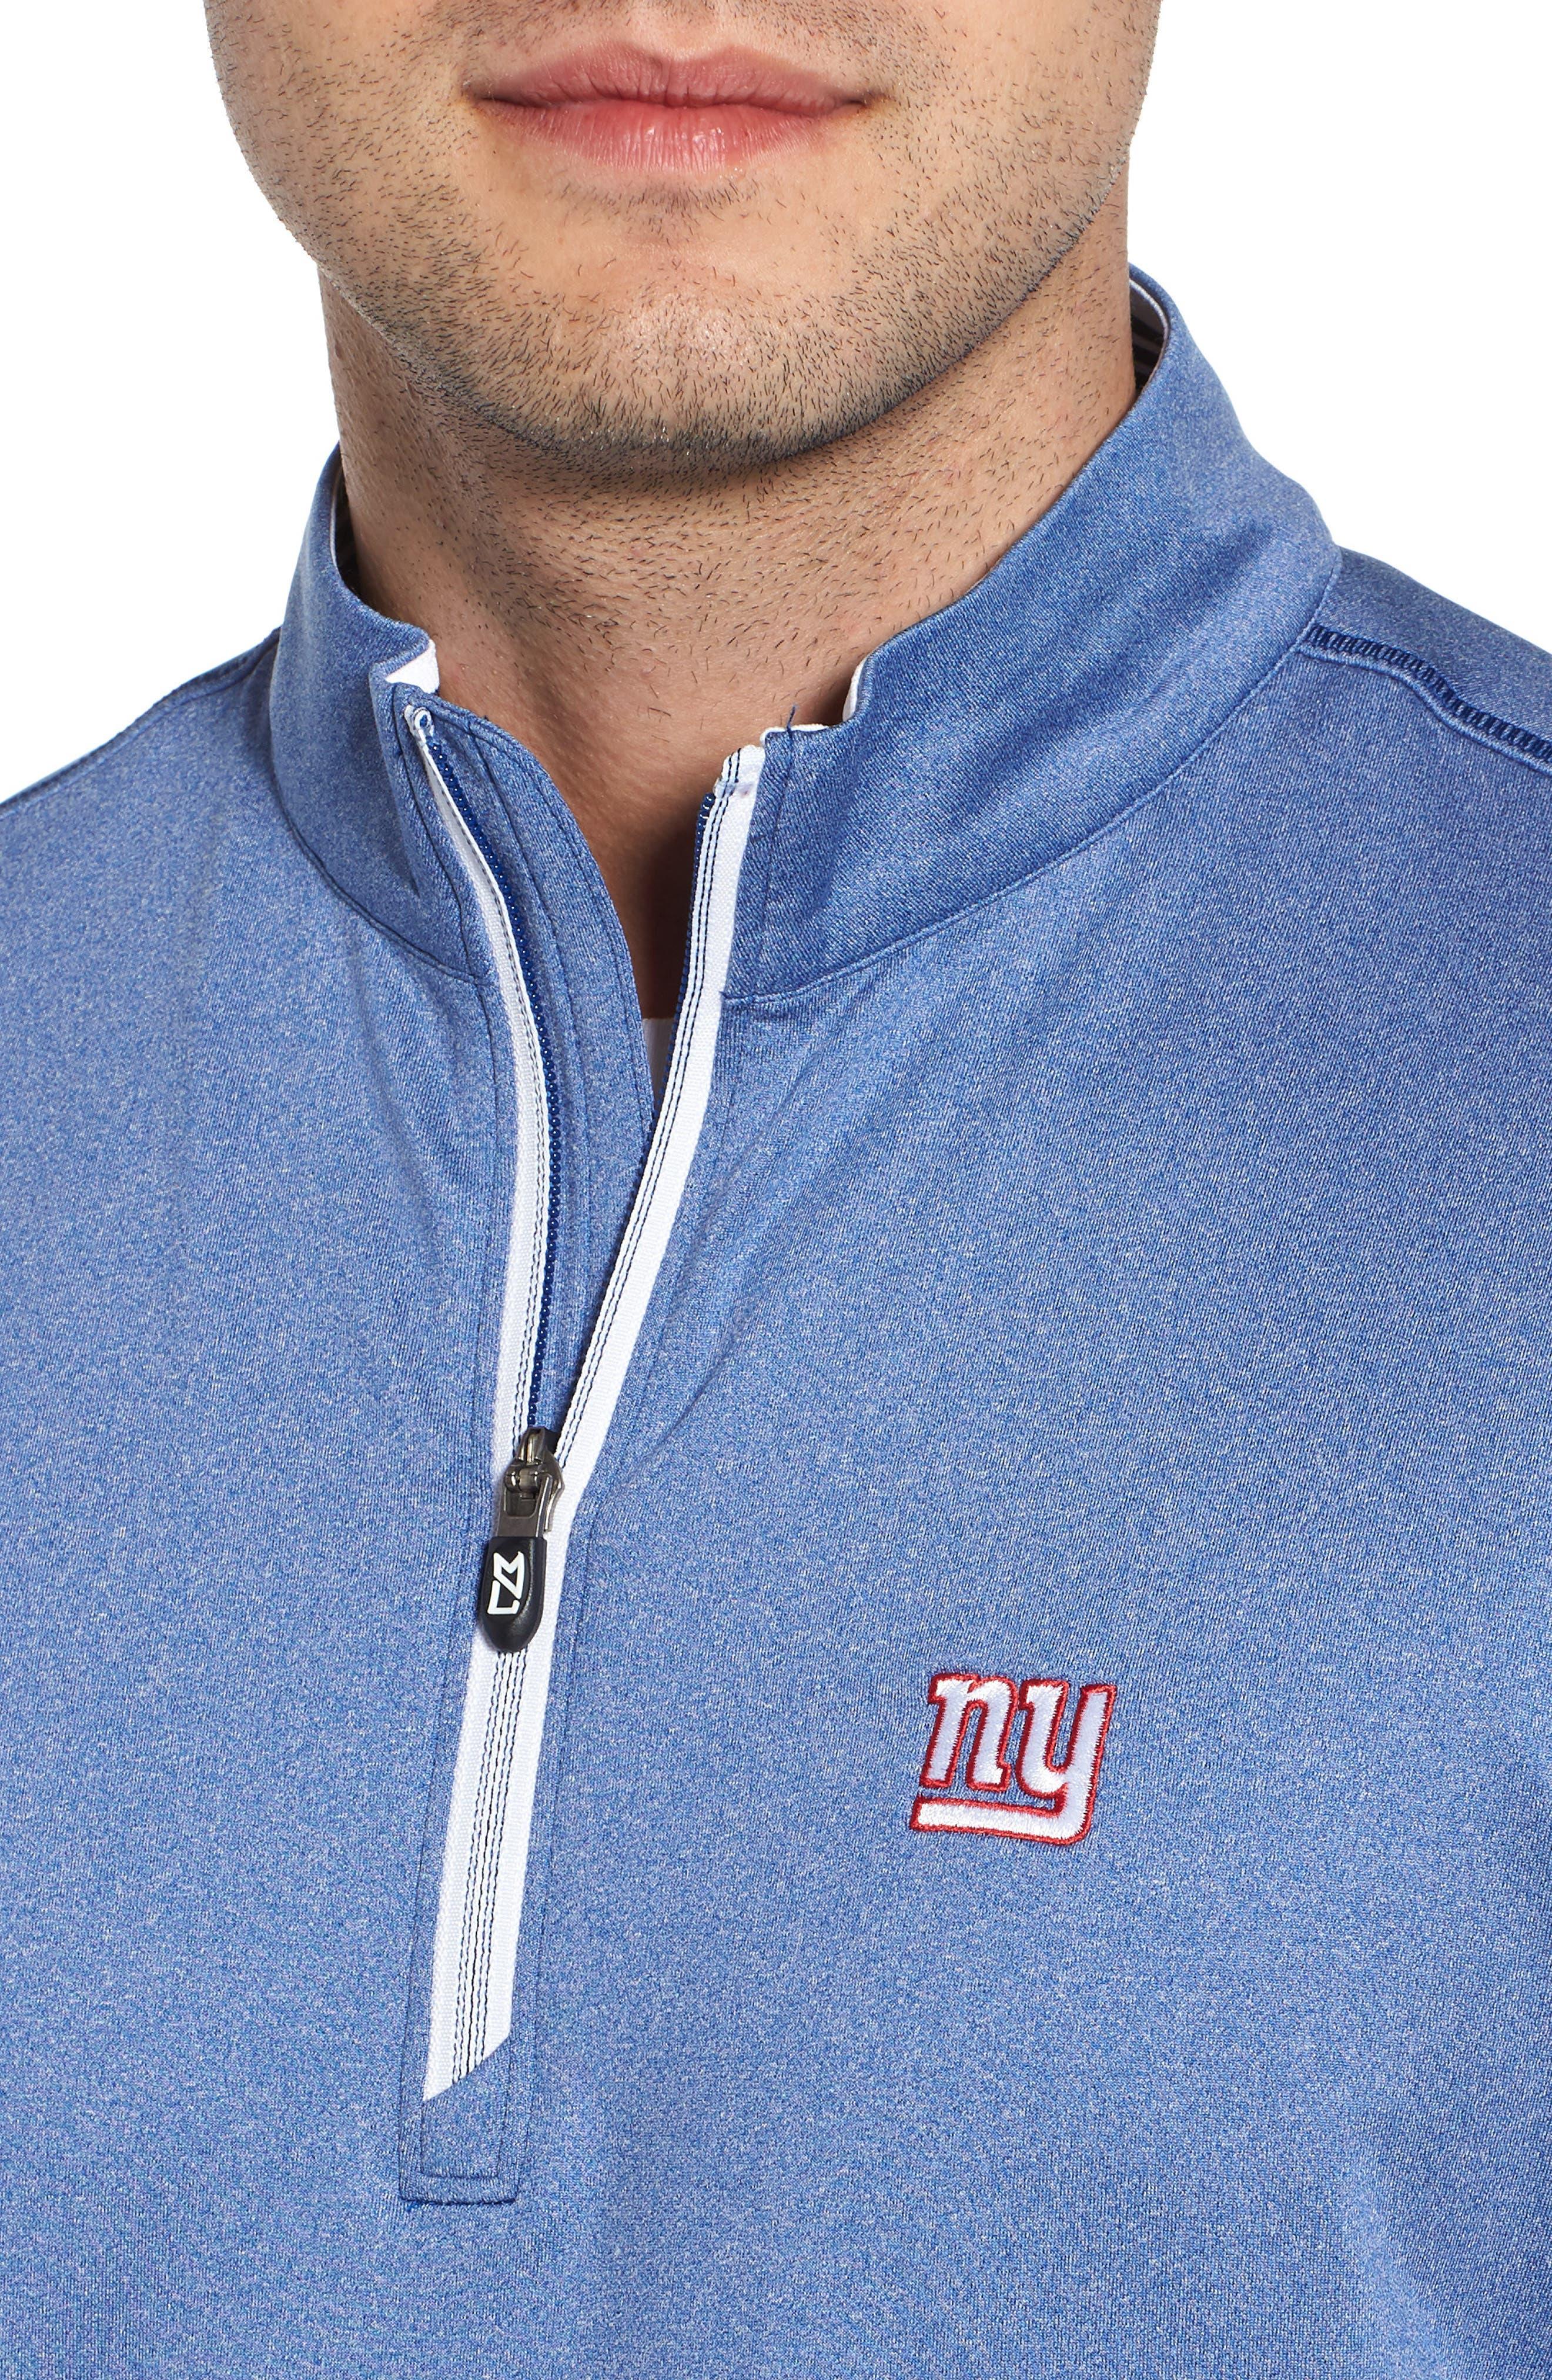 Endurance New York Giants Regular Fit Pullover,                             Alternate thumbnail 4, color,                             TOUR BLUE HEATHER